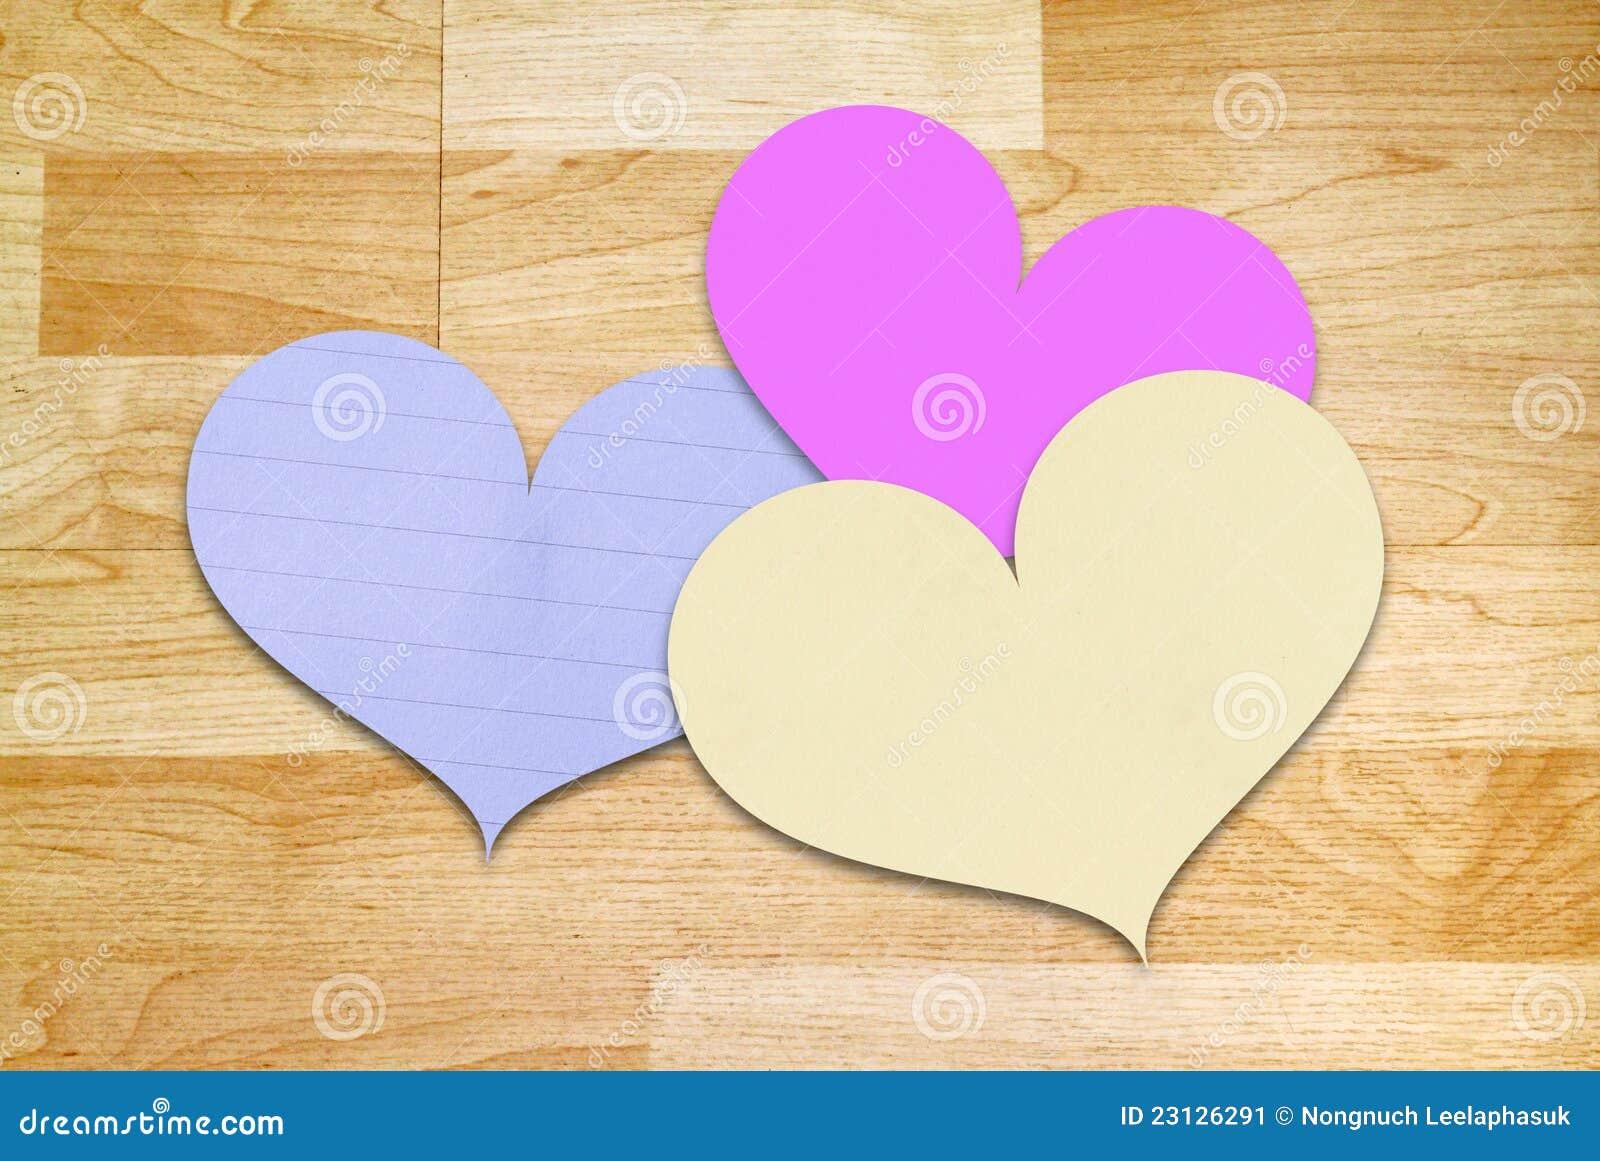 heart shape paper for valentine 39 s day stock image image. Black Bedroom Furniture Sets. Home Design Ideas